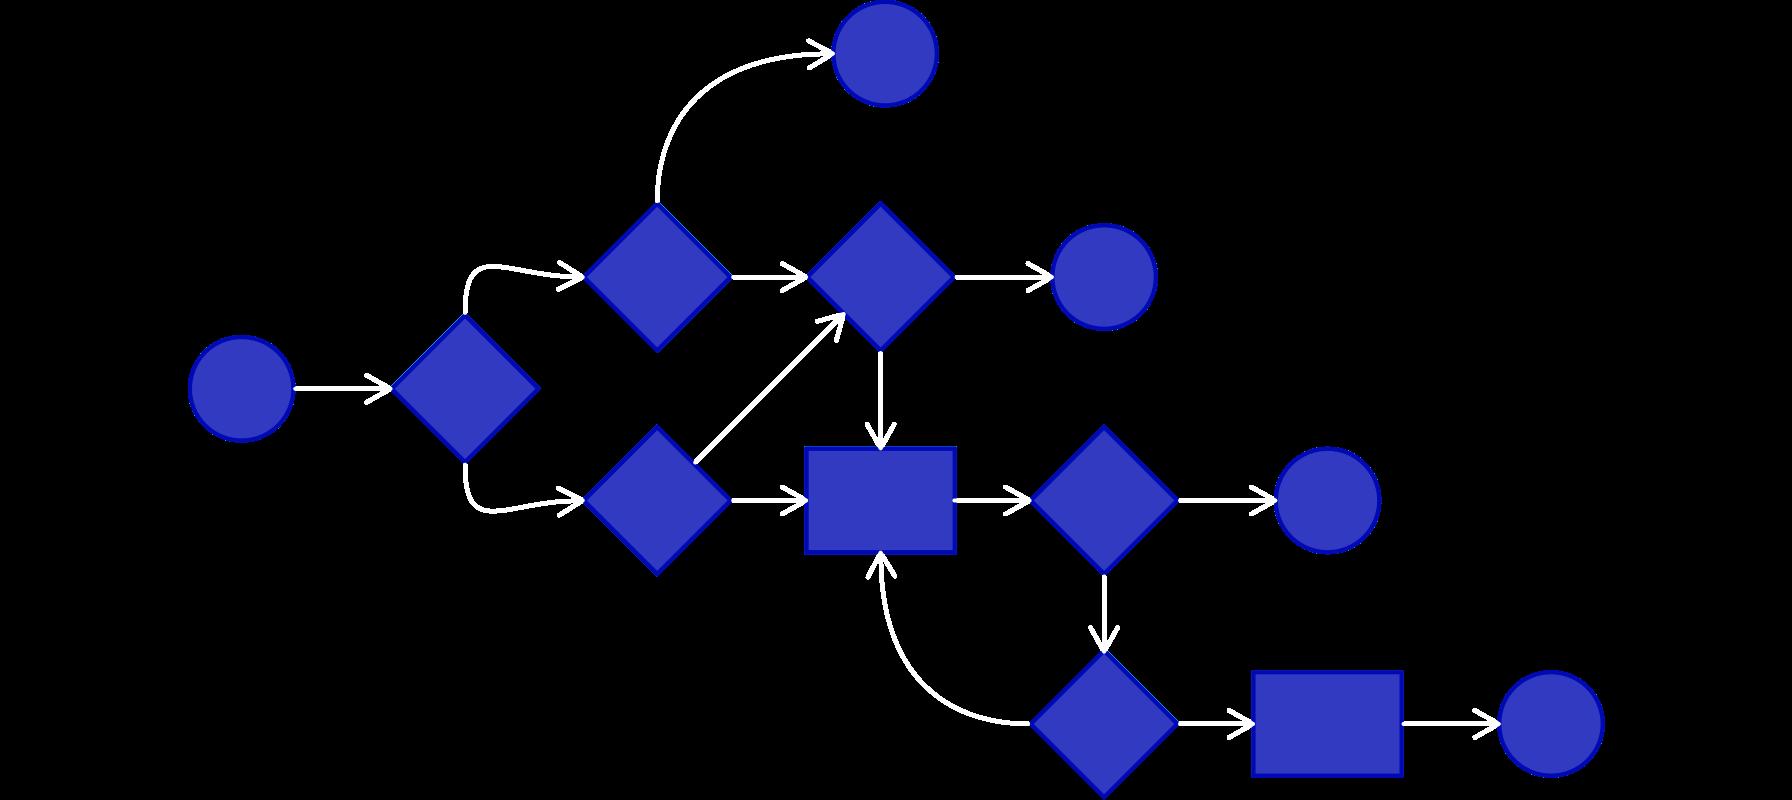 Zilla decision flow silhouette